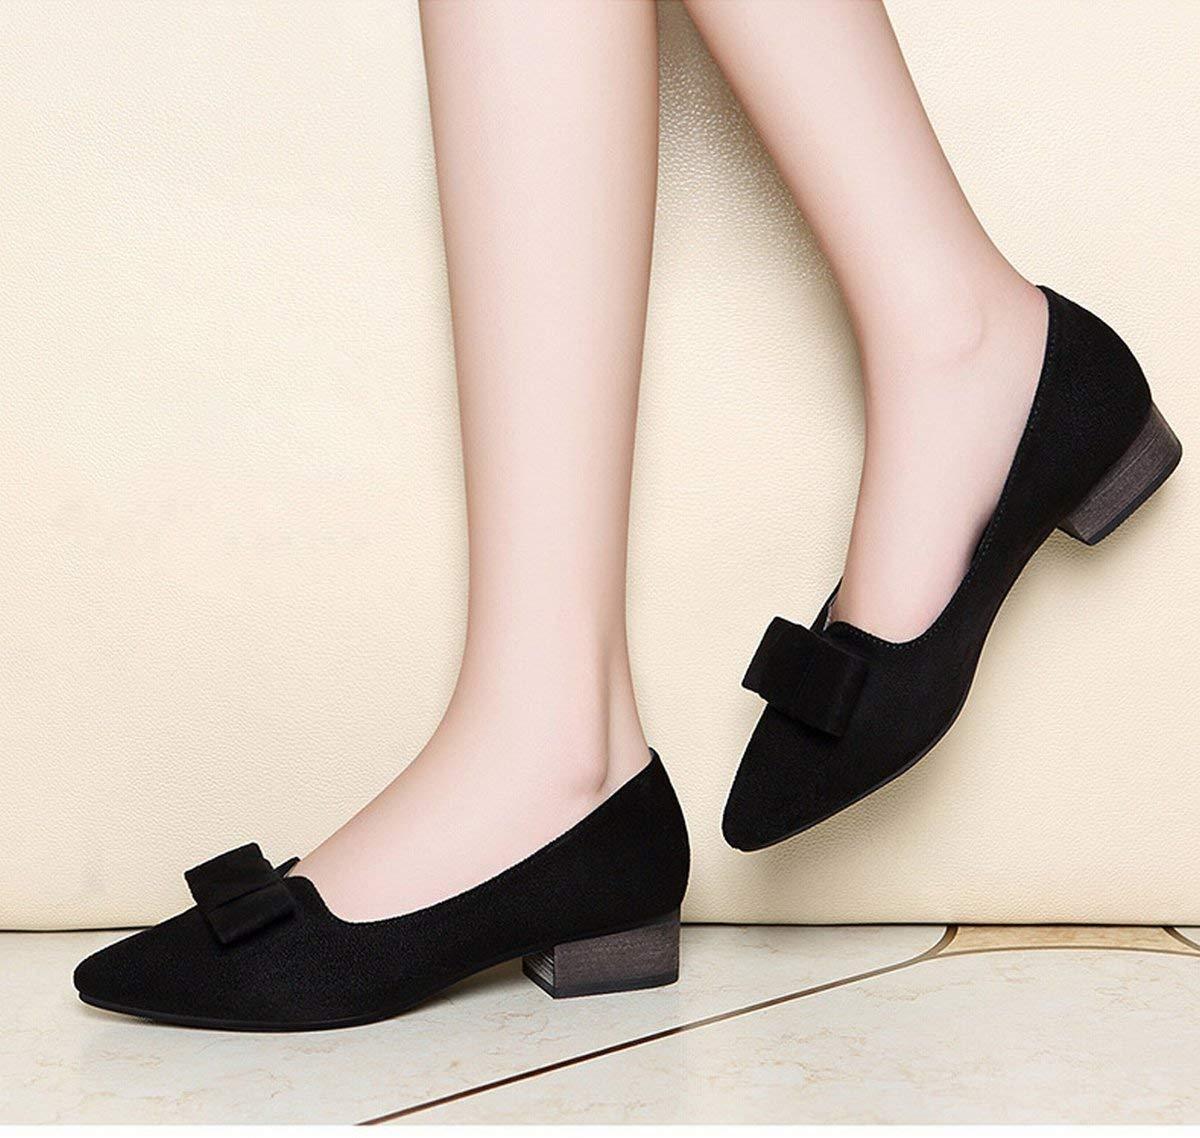 Fuxitoggo Fuxitoggo Fuxitoggo Spitz Schleife Schleife mit meiner Mutter Schuhe schuhe schuhe Schuhe Pedal Schuhe (Farbe   Schwarz Größe   37) 9e2a42